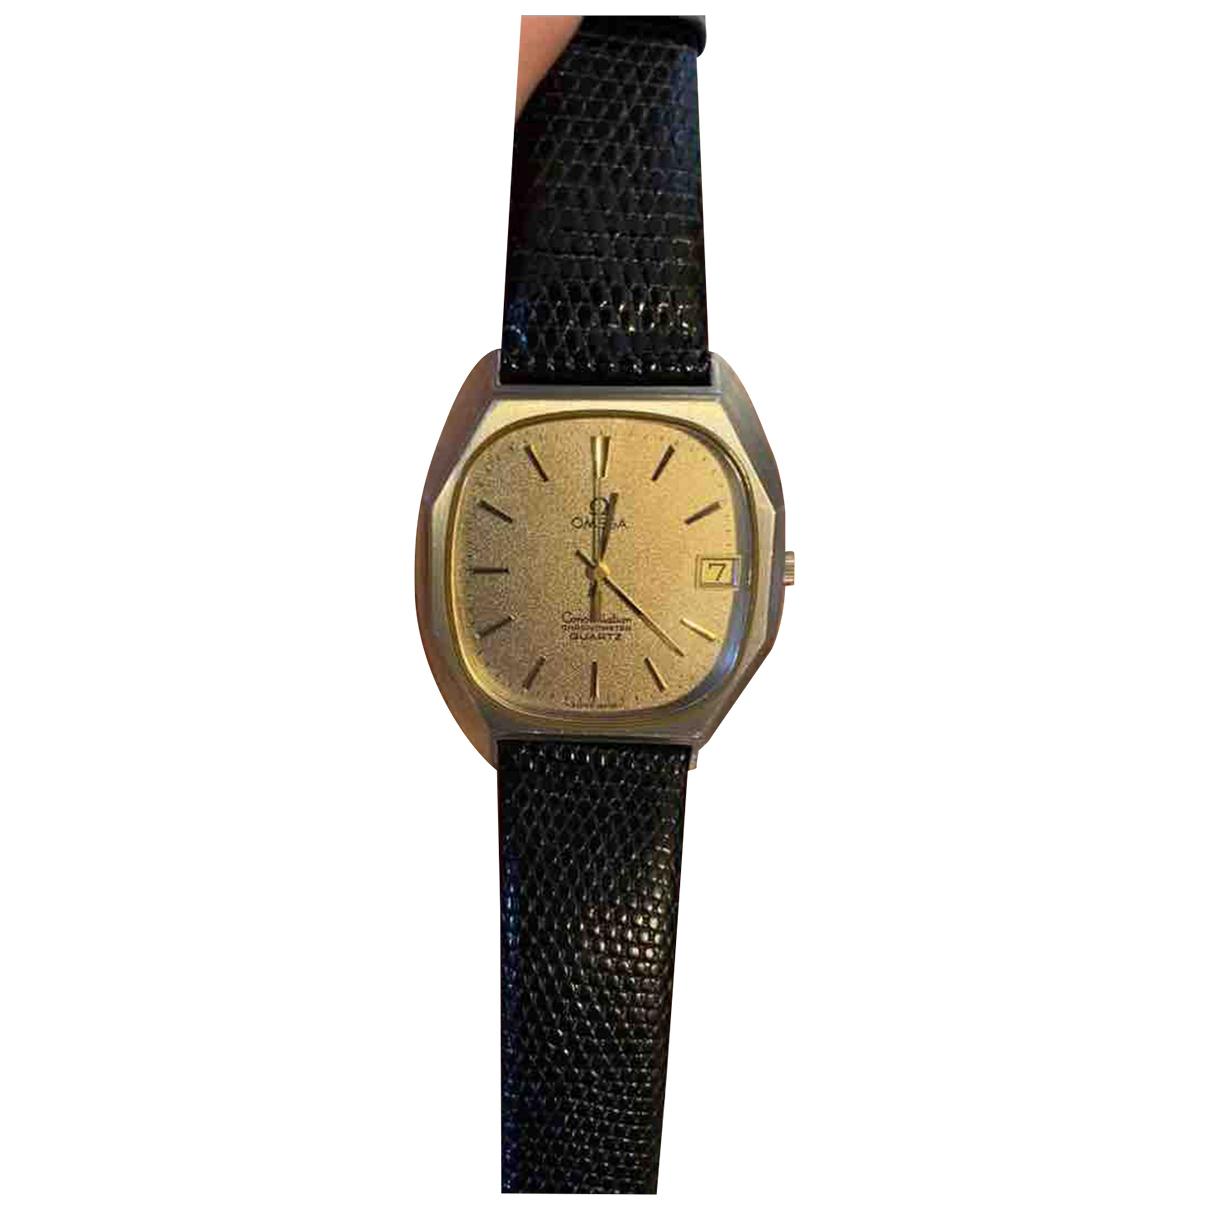 Omega Constellation Uhr in  Gold Stahl